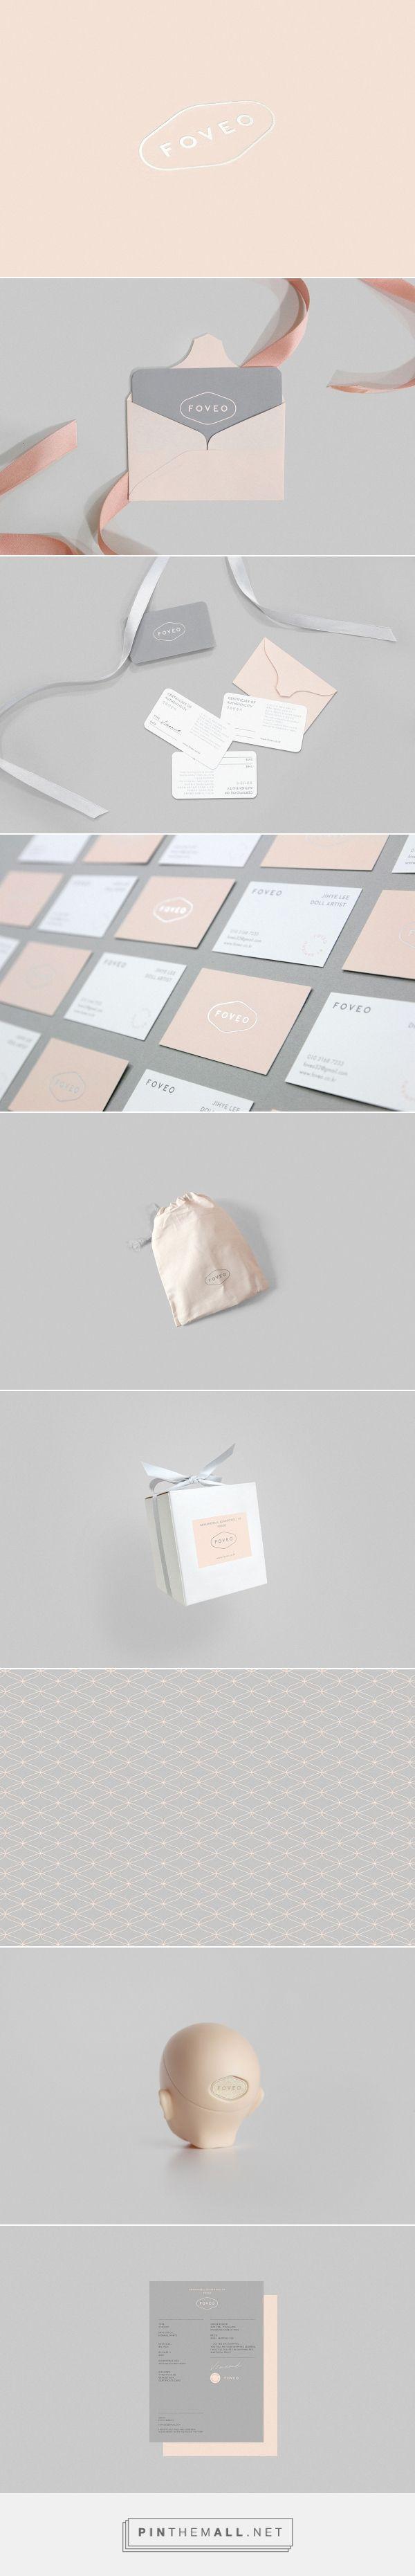 Foveo Branding by Triangle Studio on Behance | Fivestar Branding – Design and Branding Agency & Inspiration Gallery